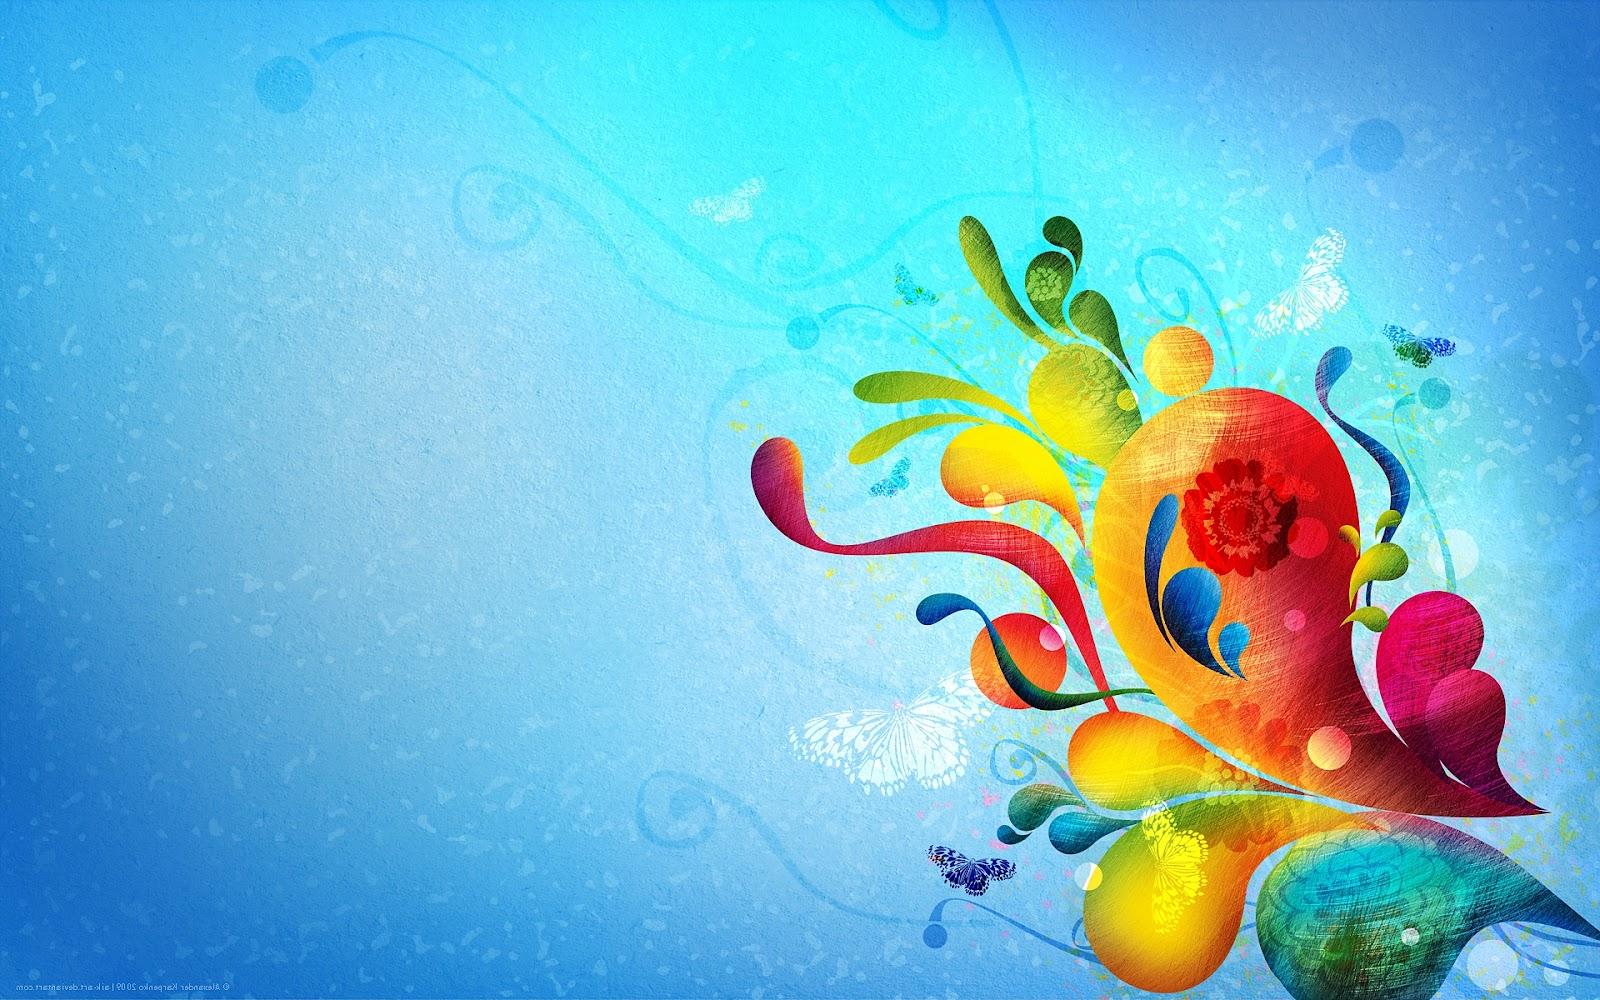 HD IPhone Cute Desktop Wallpapers Colorful Nature 1600x1000